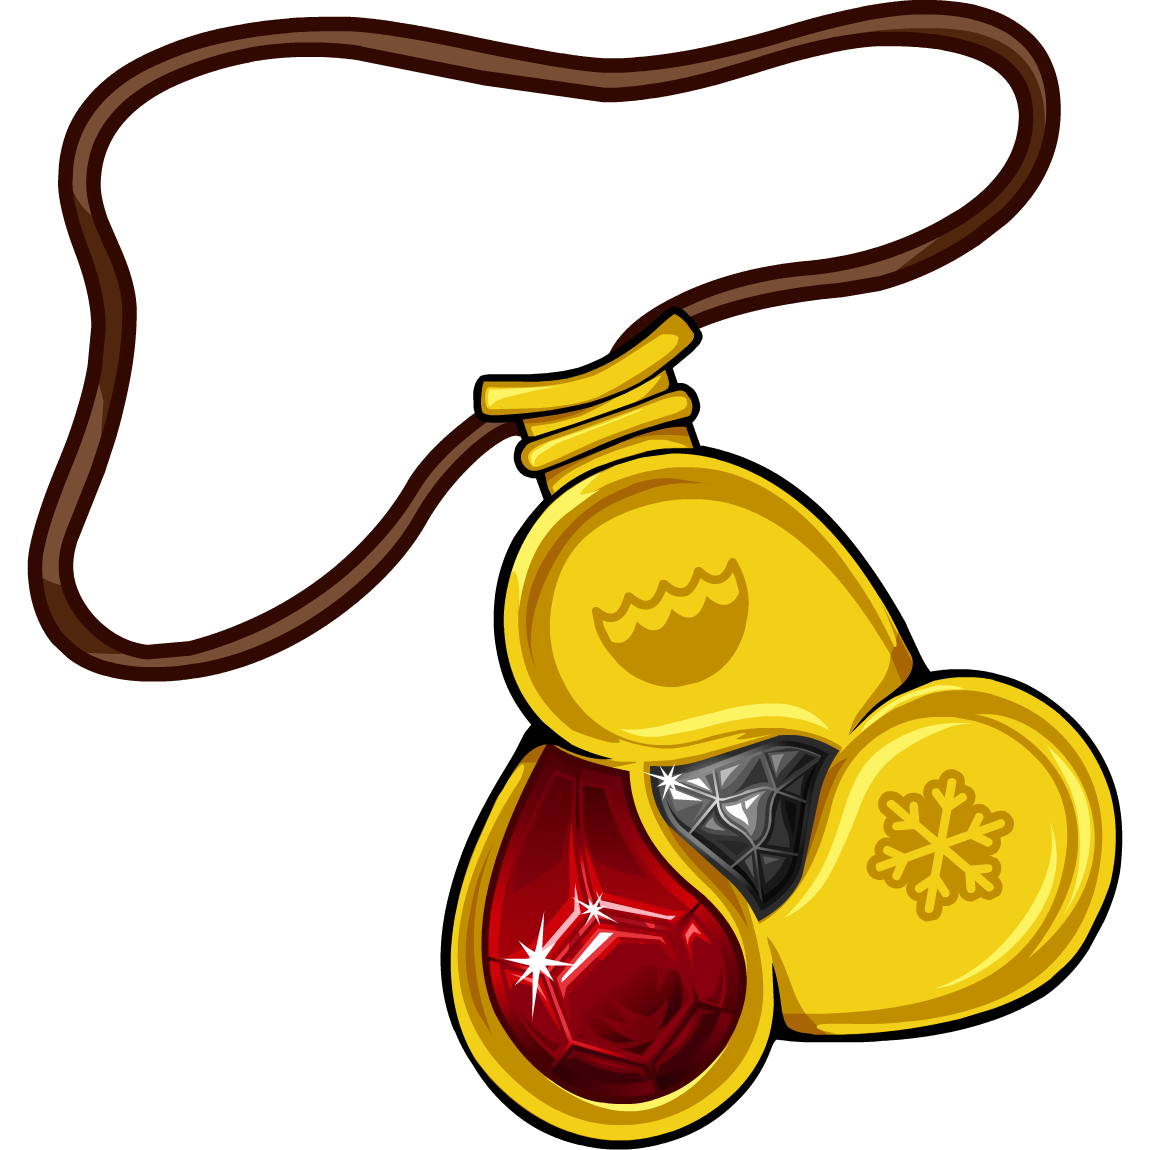 Amulet Clipart PNG Image